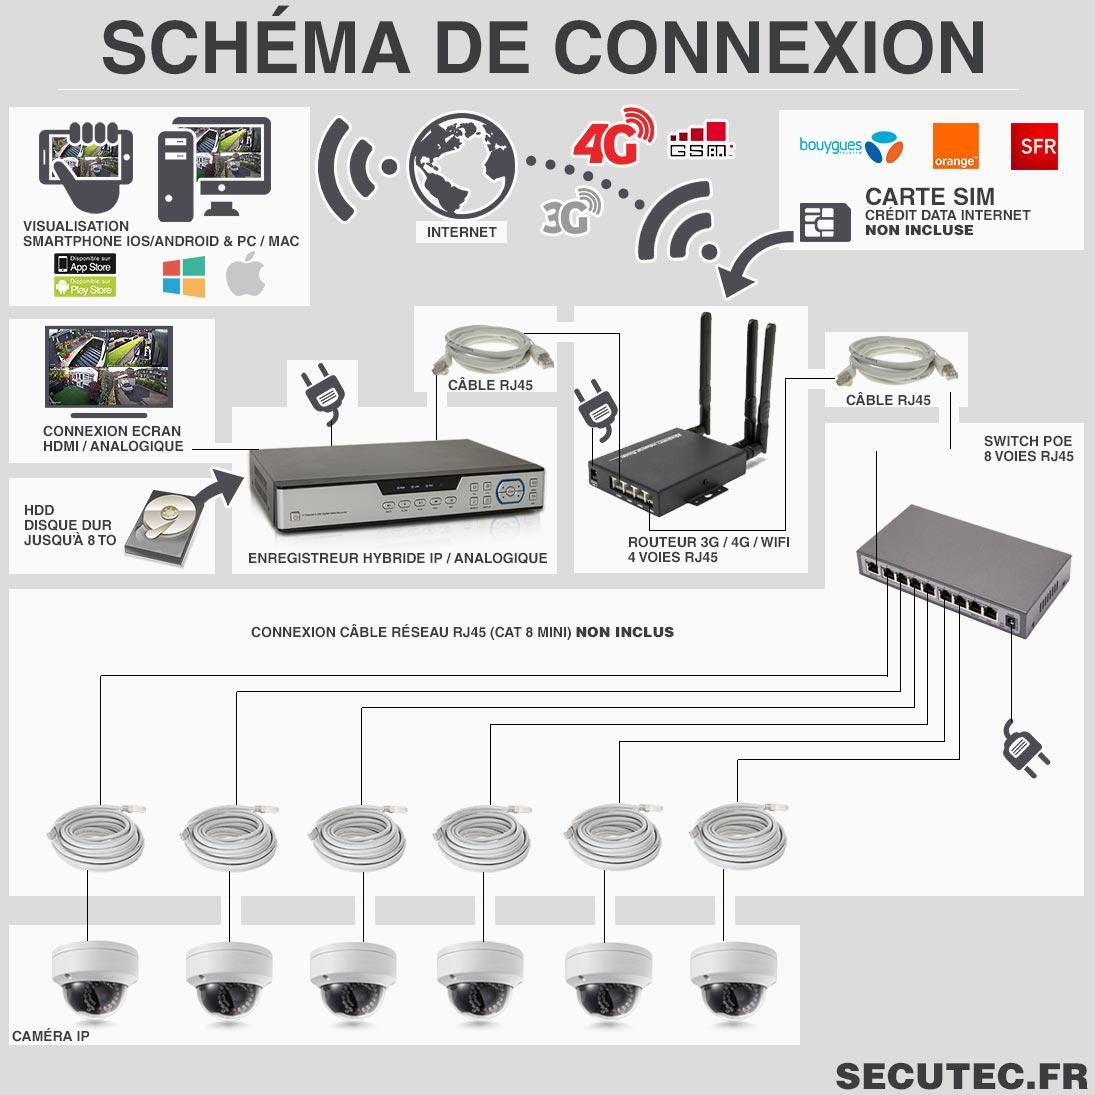 schéma de connexion